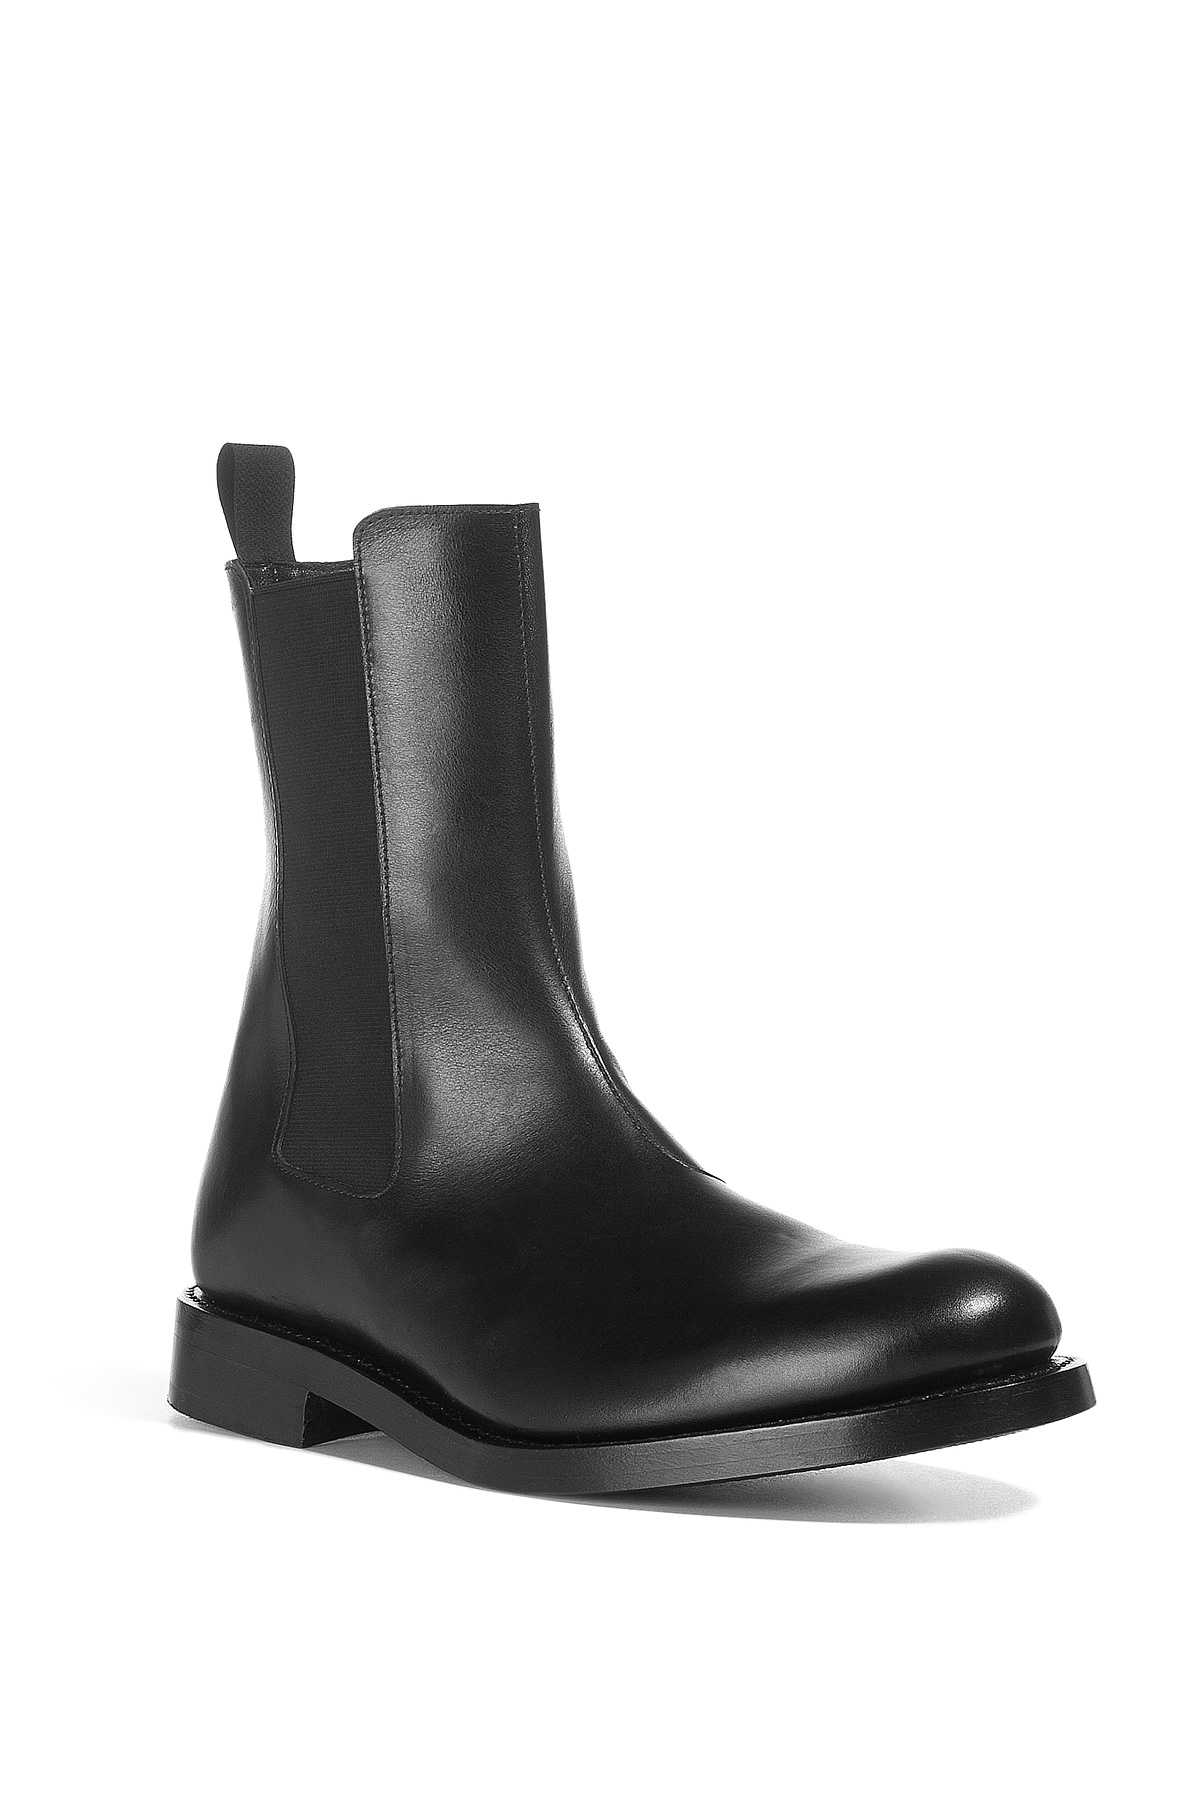 Balmain Black Half Boots In Black For Men Lyst